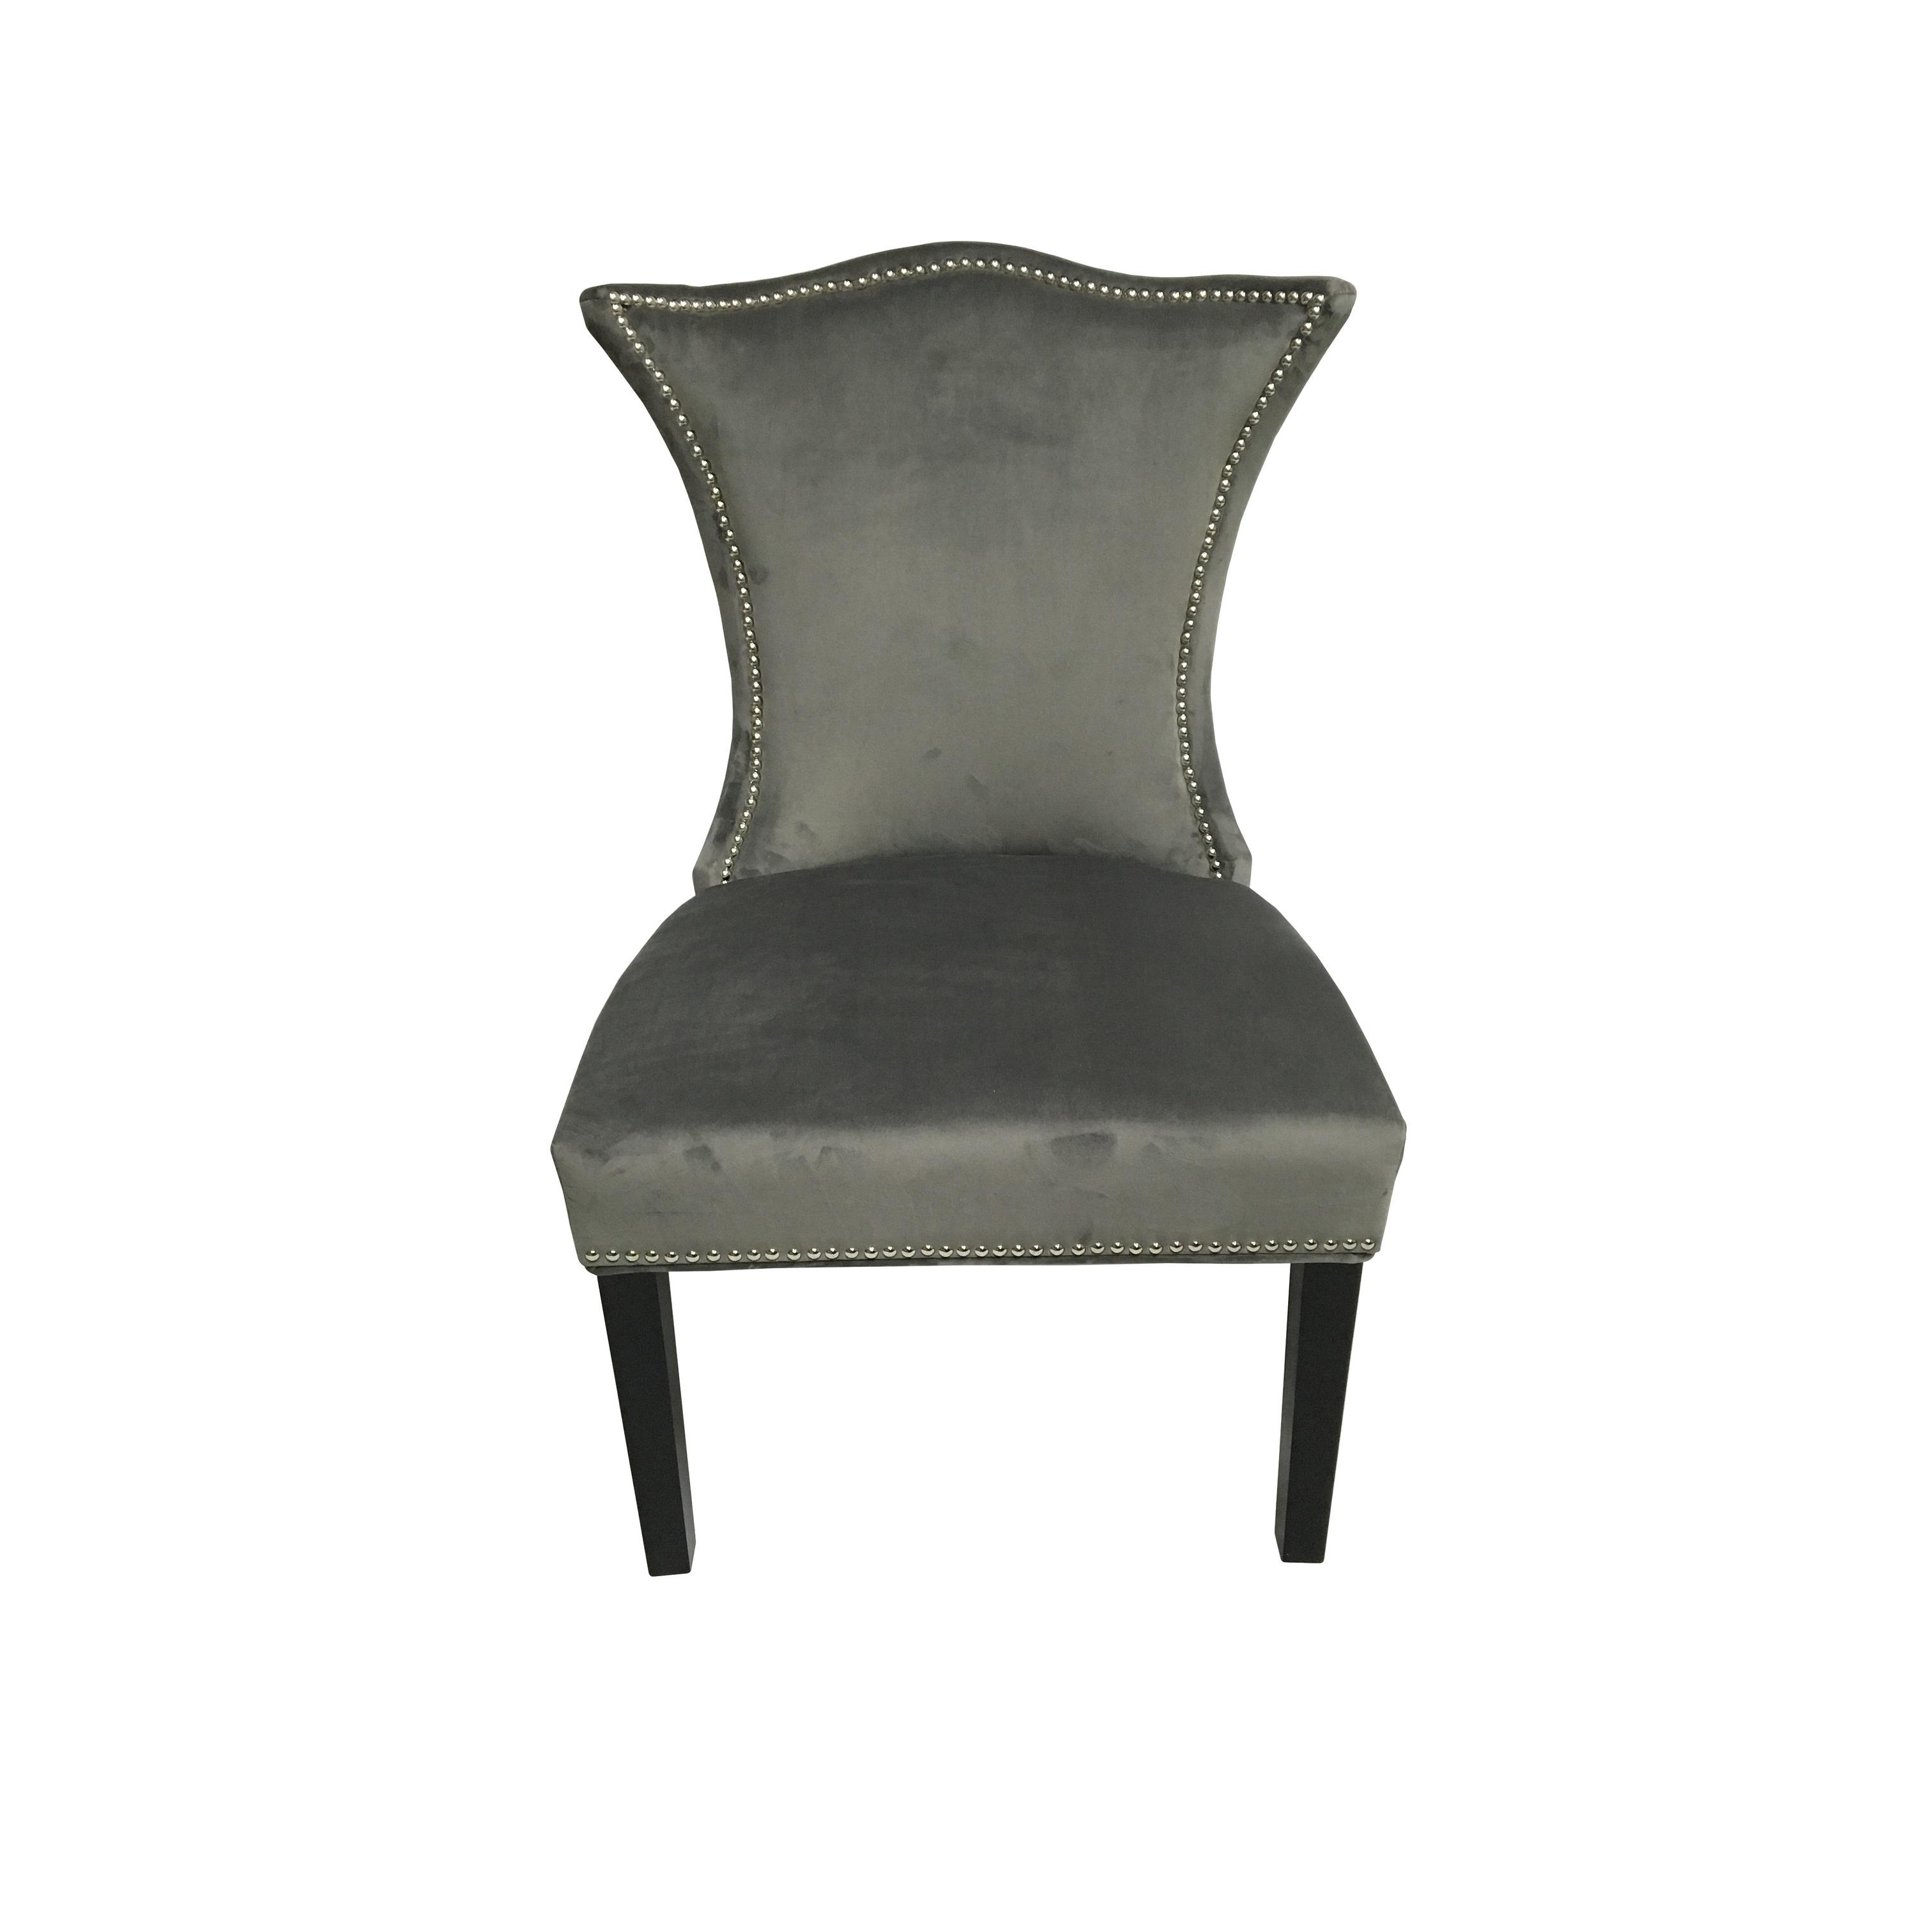 HD Couture Linda Chair Grey, China (Birch)